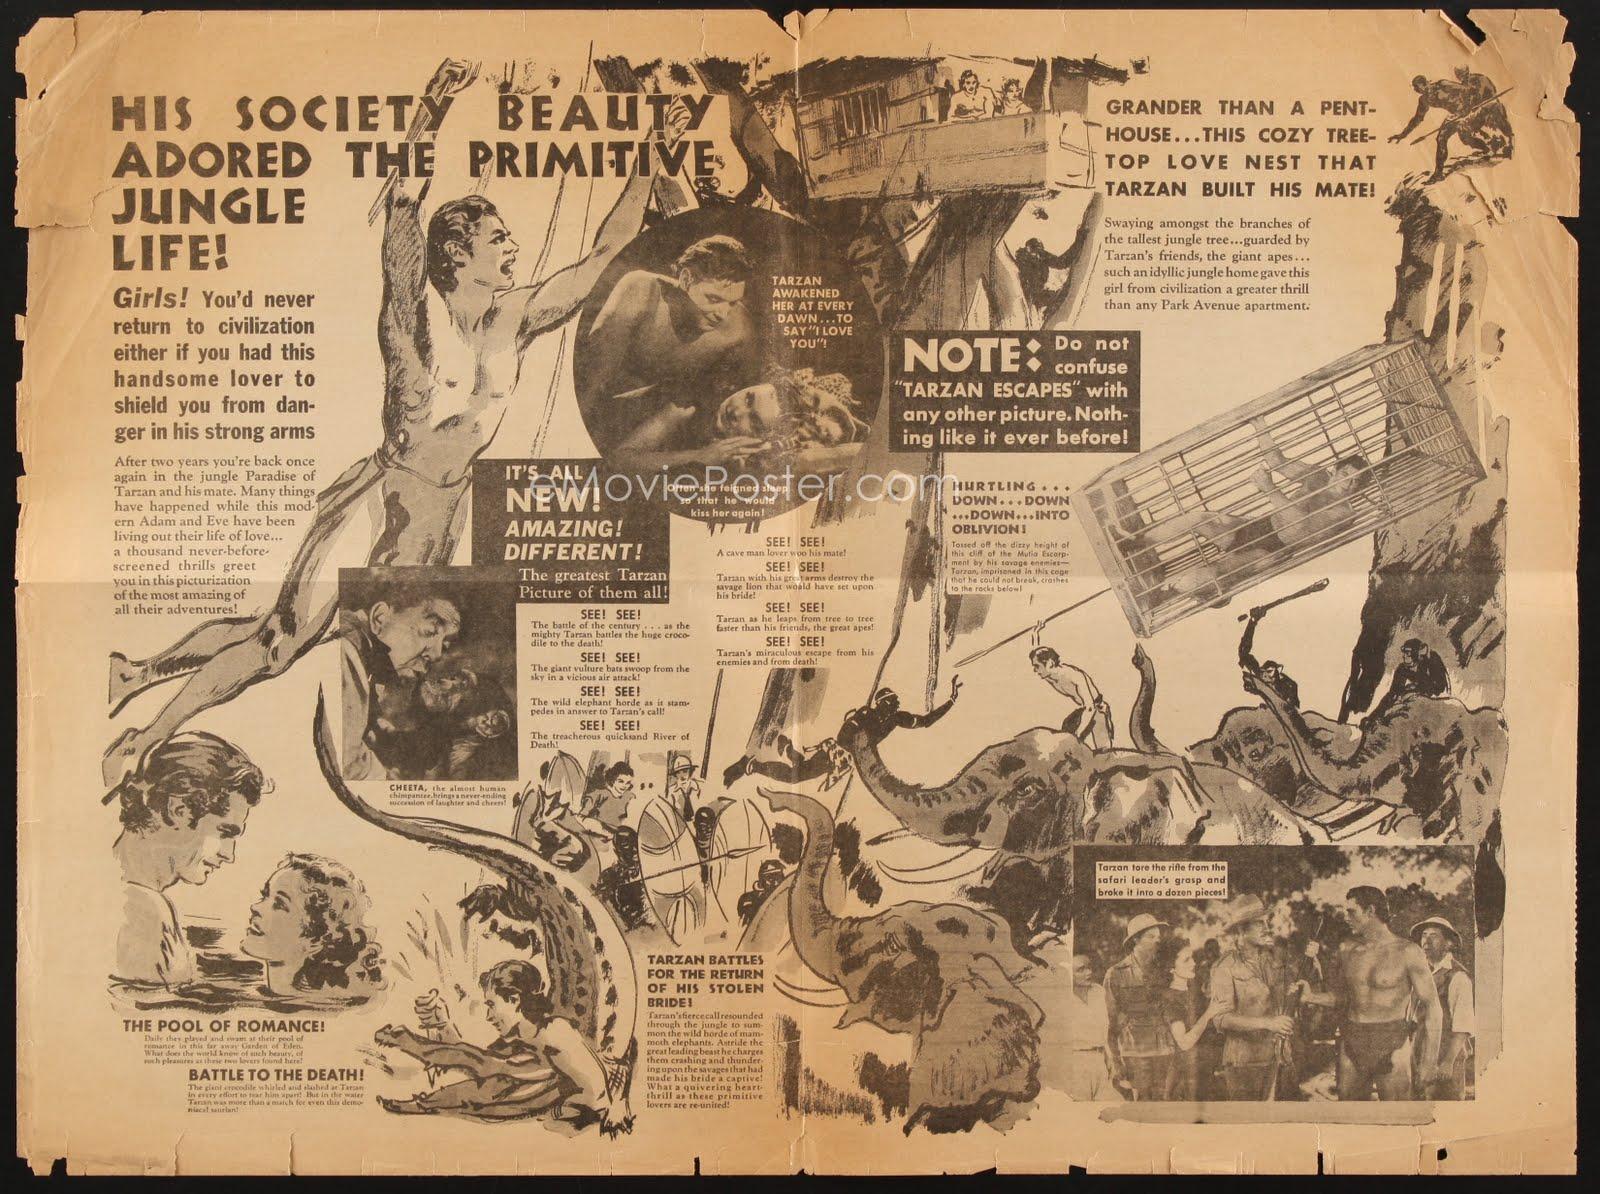 Café Roxy: Tarzan Escapes - Bat Bait